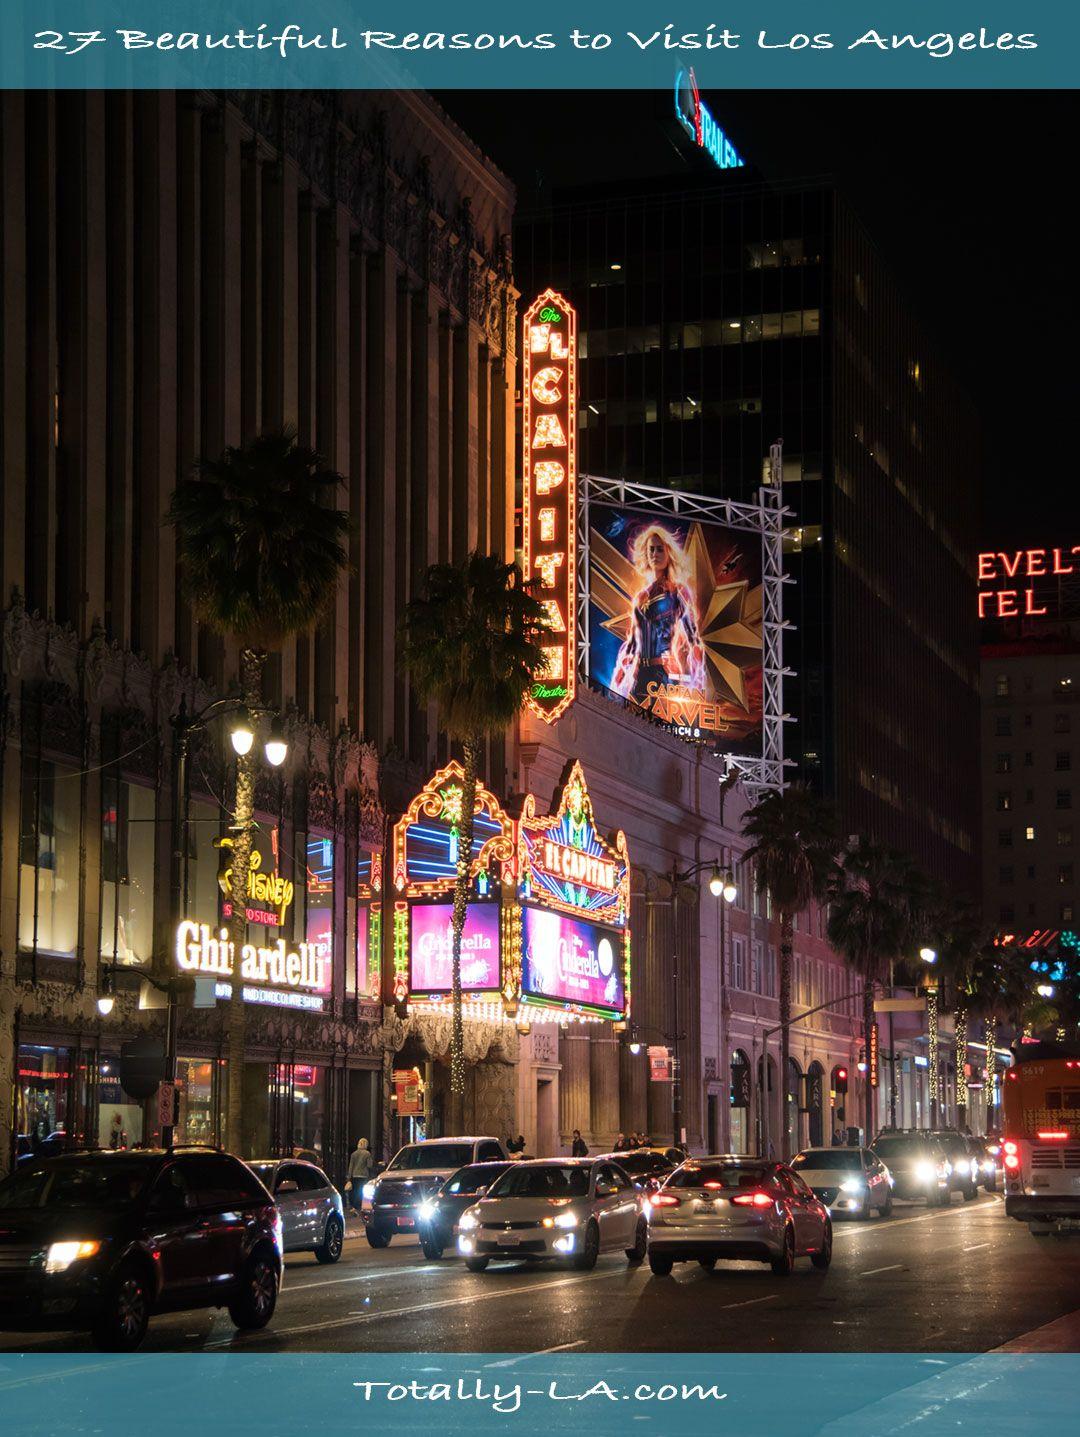 27 Beautiful Reasons To Visit La Visit Los Angeles La Tourist Attractions Los Angeles Tourist Attractions